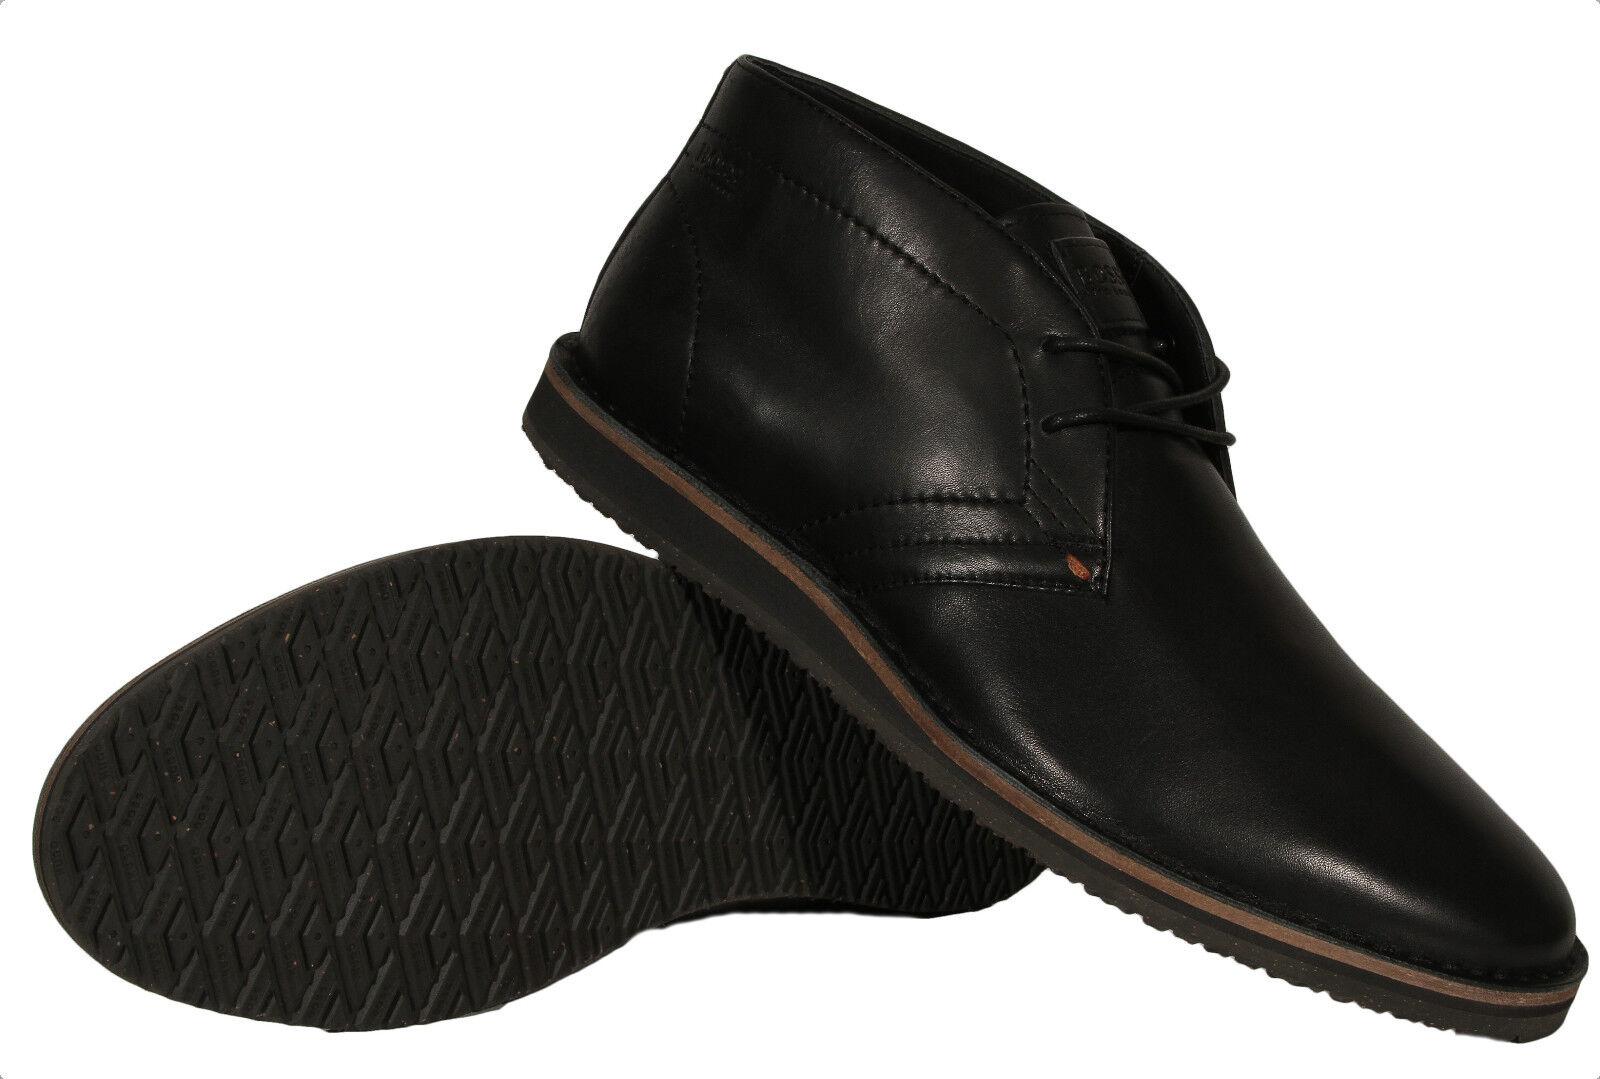 Hugo Boss Volusi Black Men's Leather Boots Mid Top By Boss orange 50298054 001